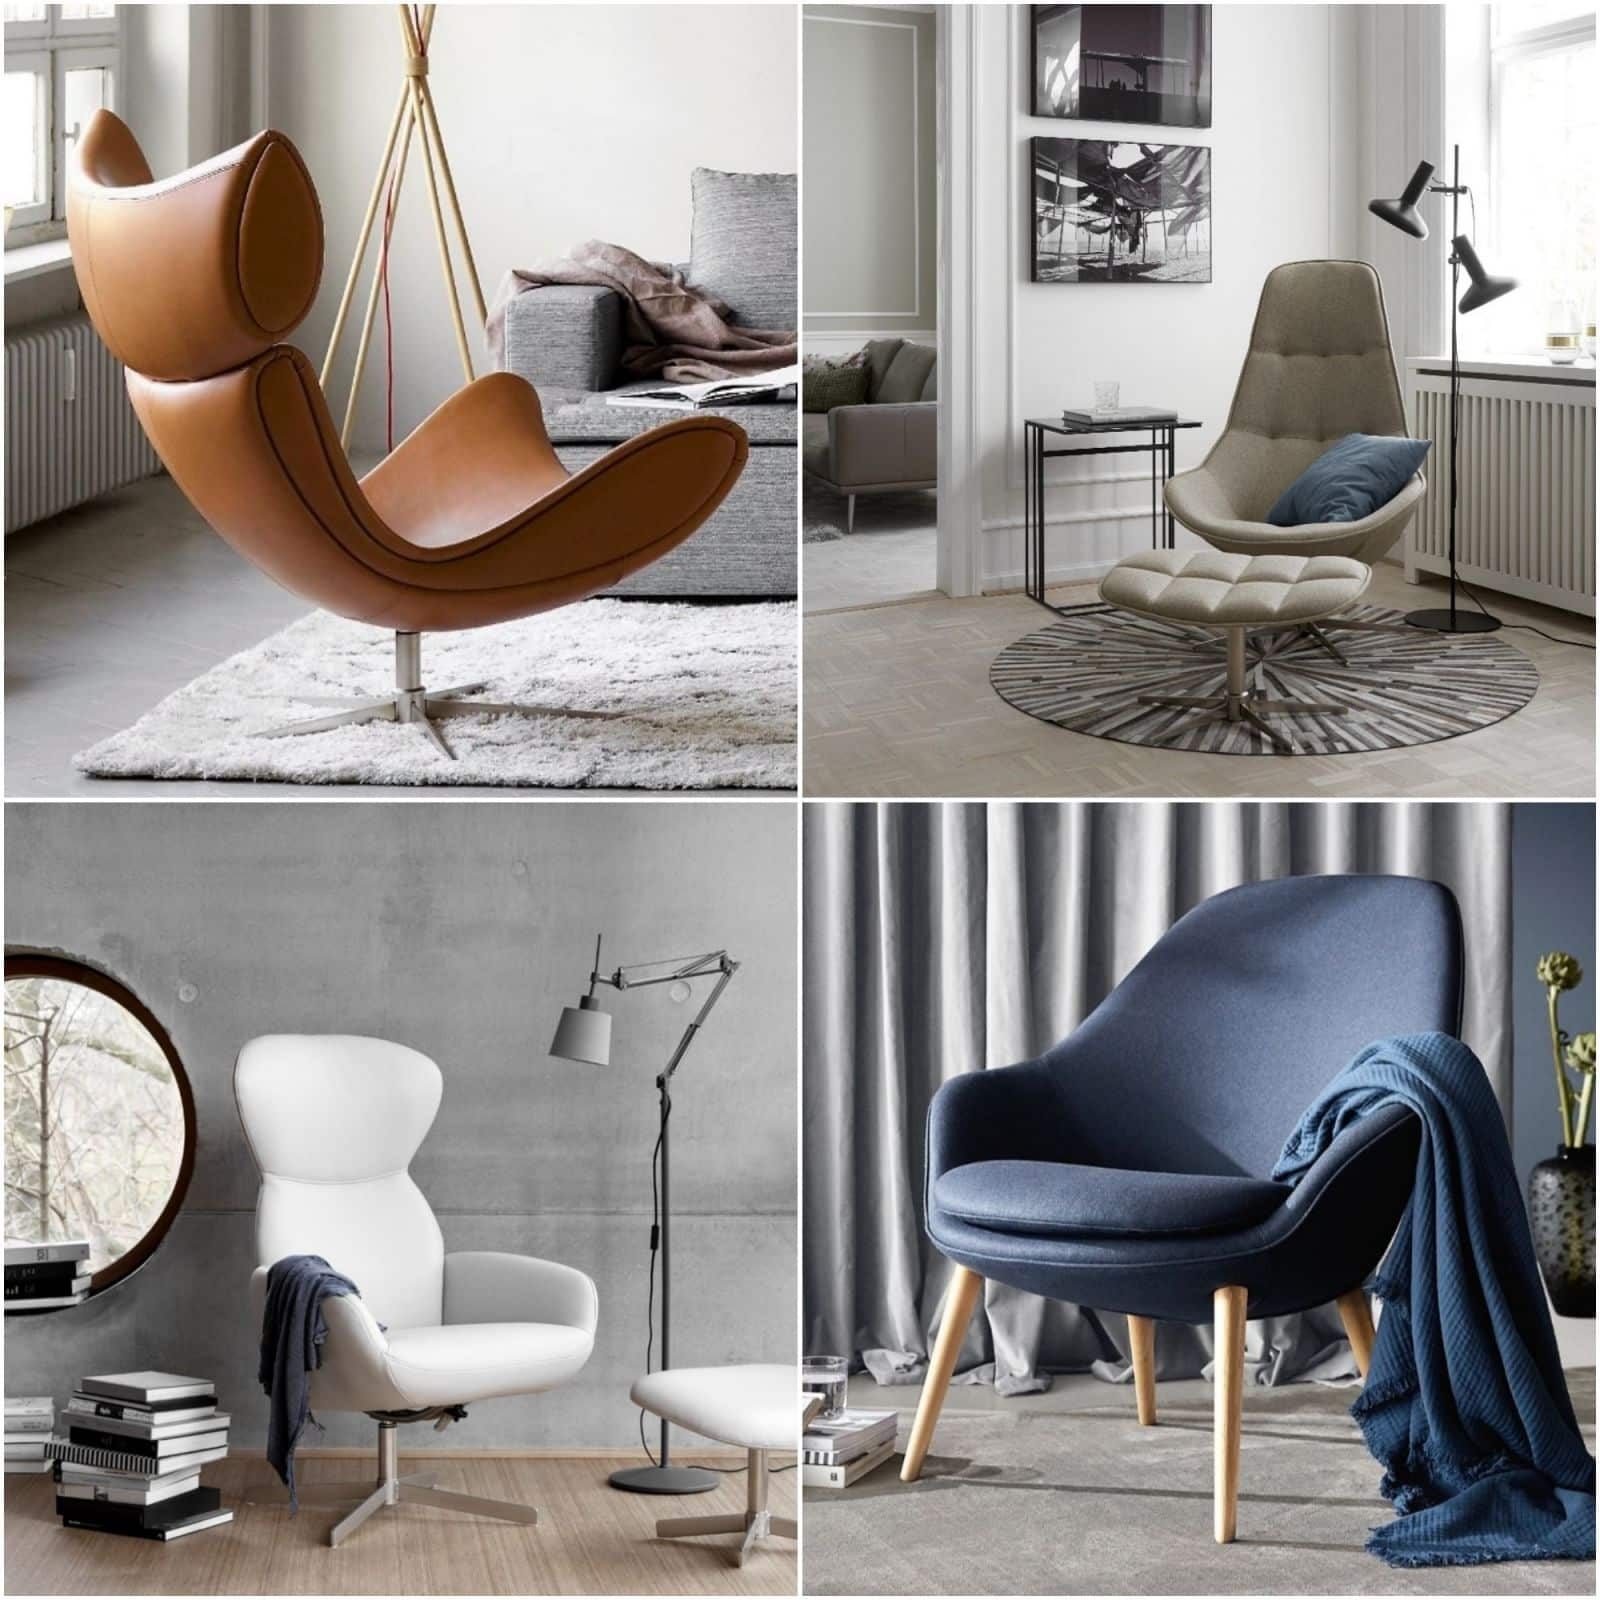 reno sessel boconcept experience hamburg am fischmarkt. Black Bedroom Furniture Sets. Home Design Ideas